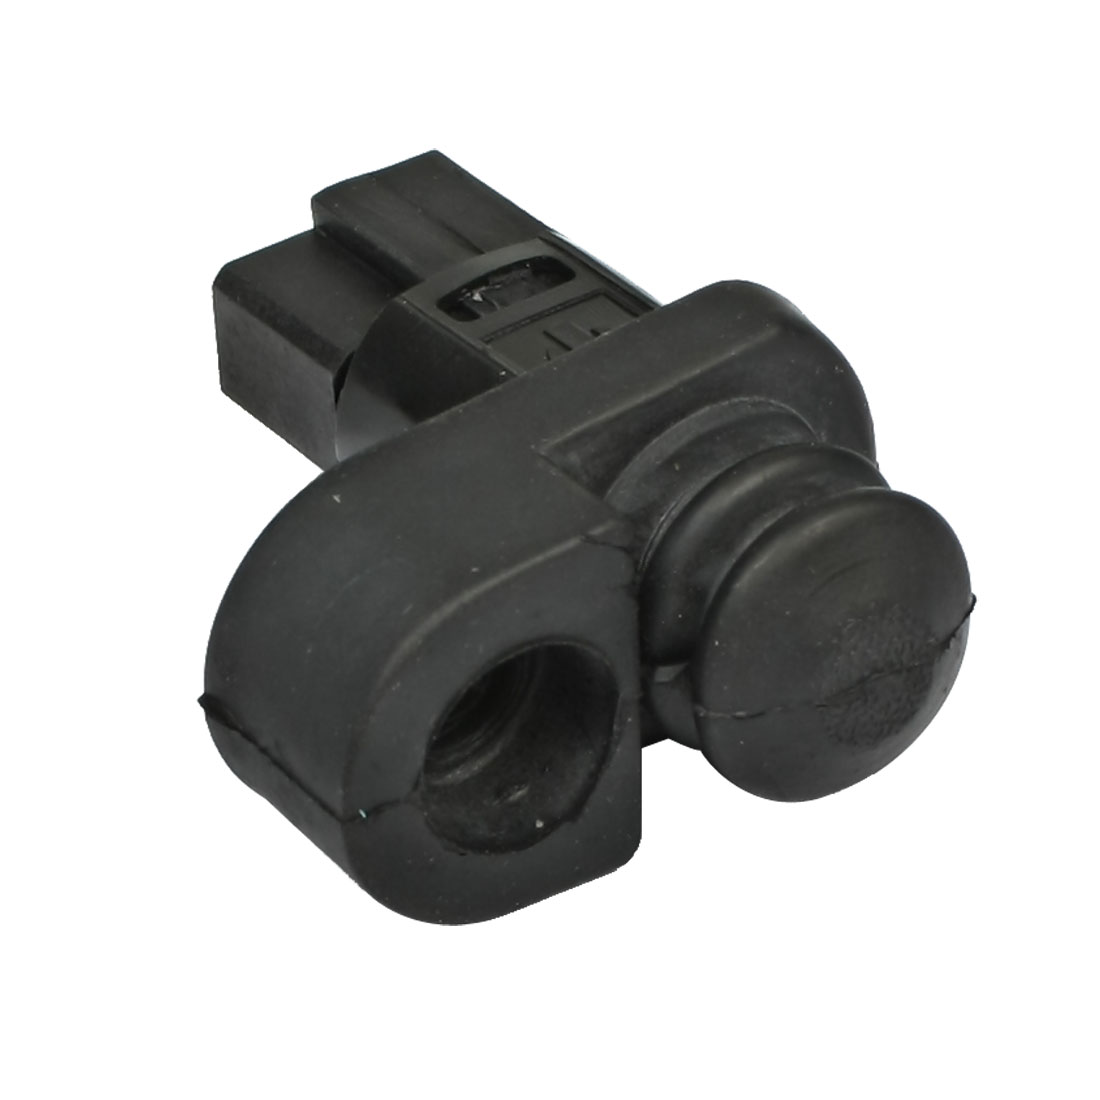 25360-41L01 Car Vehicle Door Sensor Switch Repair Accessory